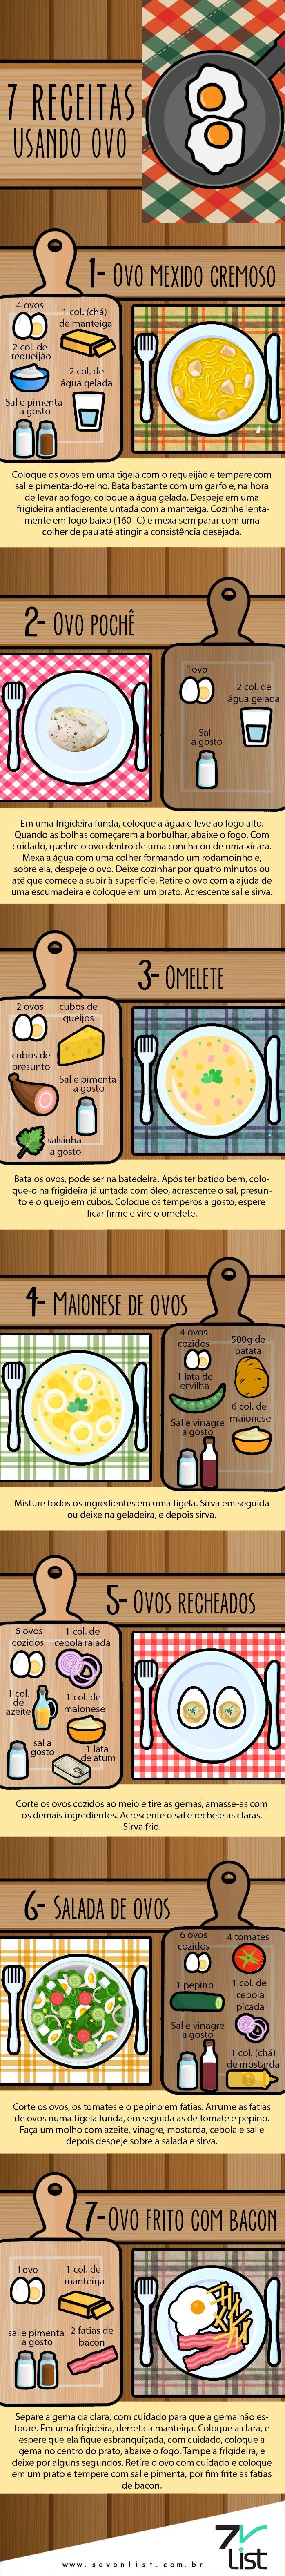 @cabidecolorido #List #List #Infográf #CabideColorido tas #Alimentaç #Ov # #Maionesedeovos #Maionese s #Saa #Ovofri